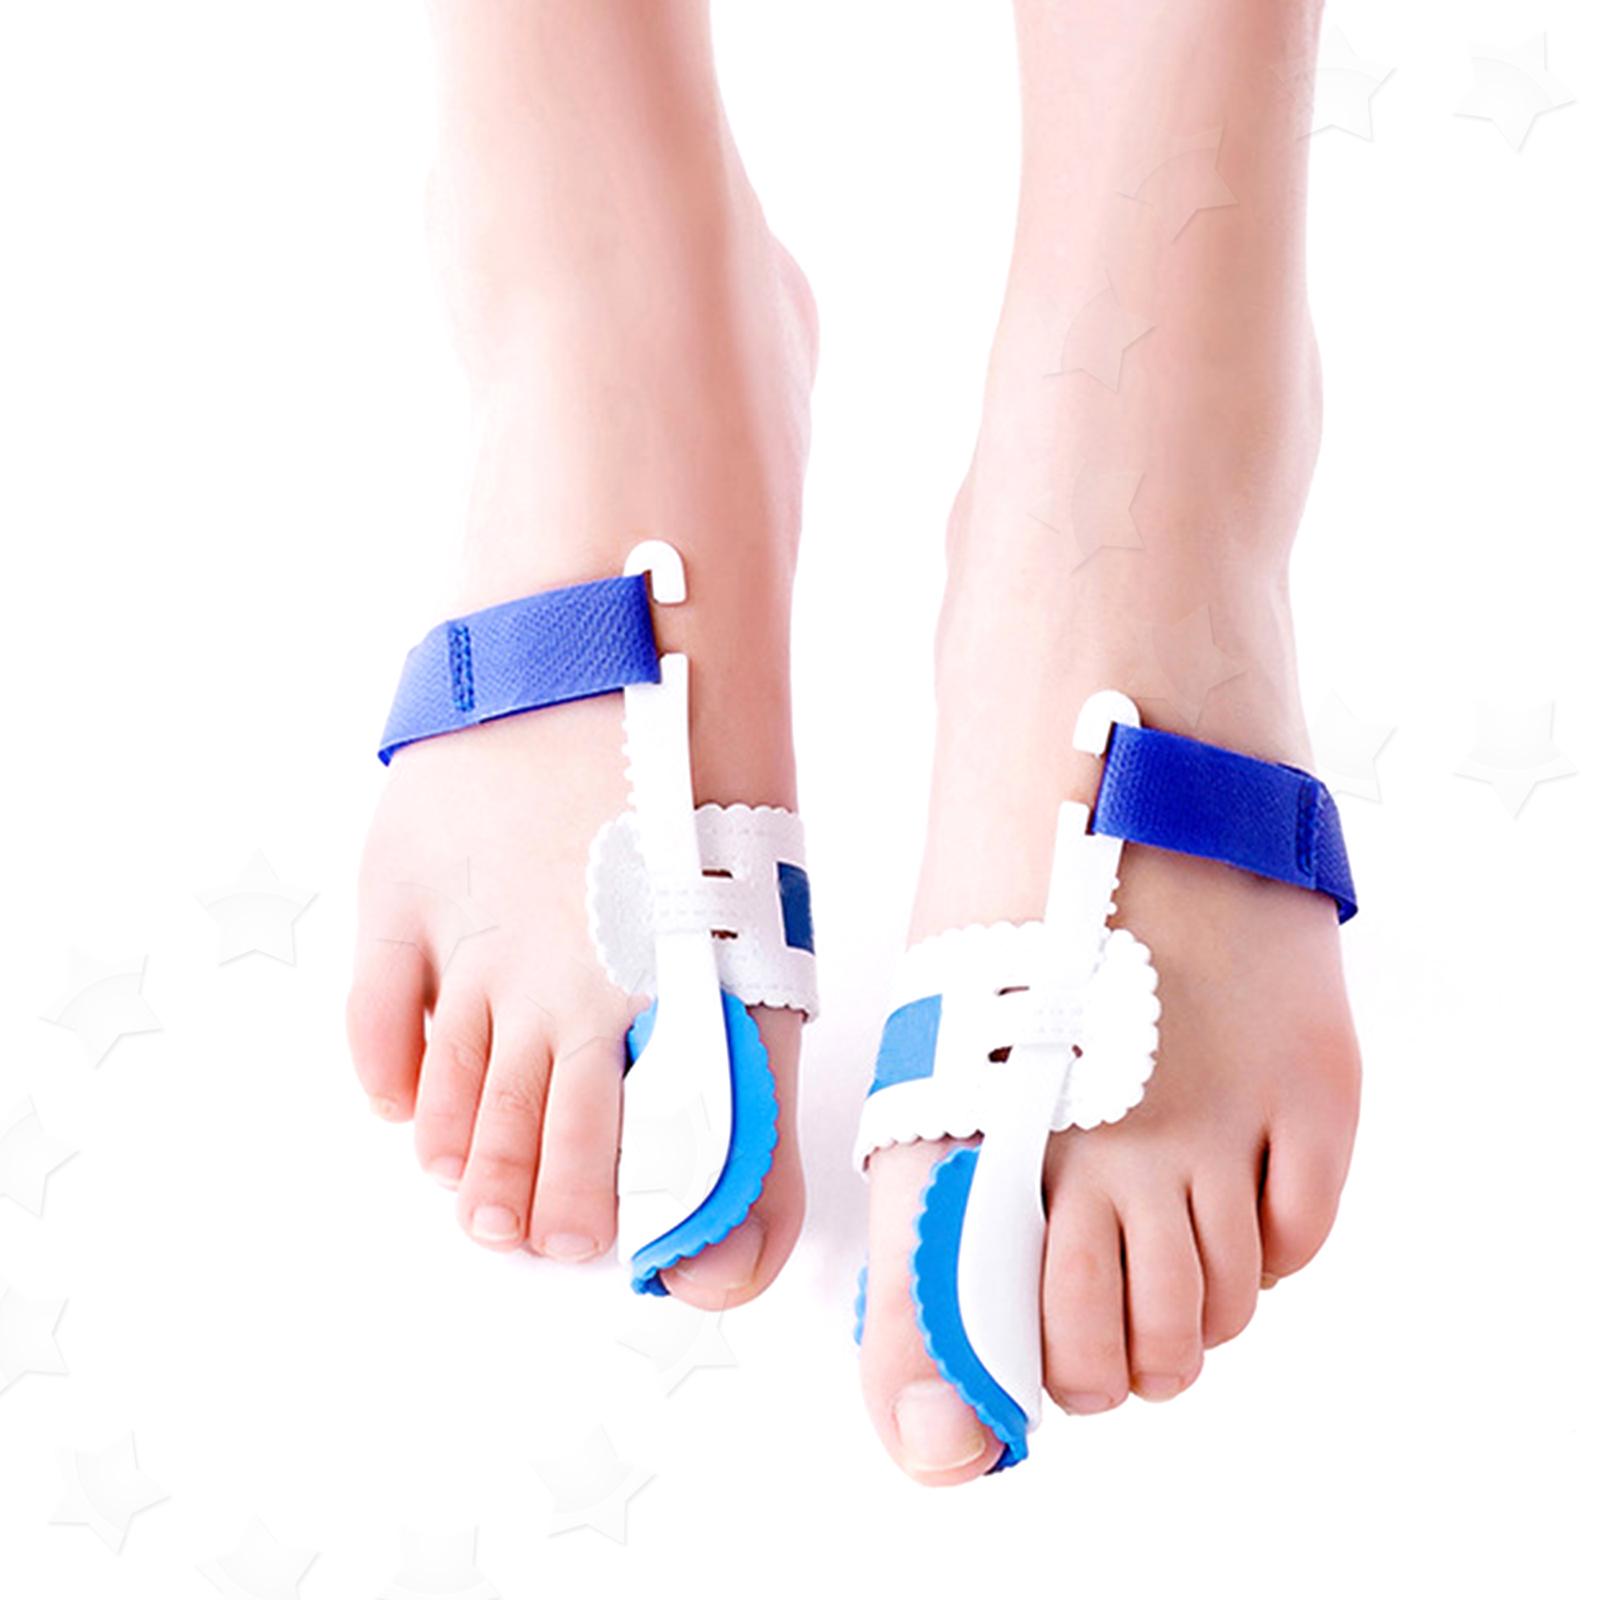 Big Toe Bunion Splint Pads Hallux Valgus Straightener Corrector Correction 1pair Silicone Foot Fingers Separator Thumb Protect 2x